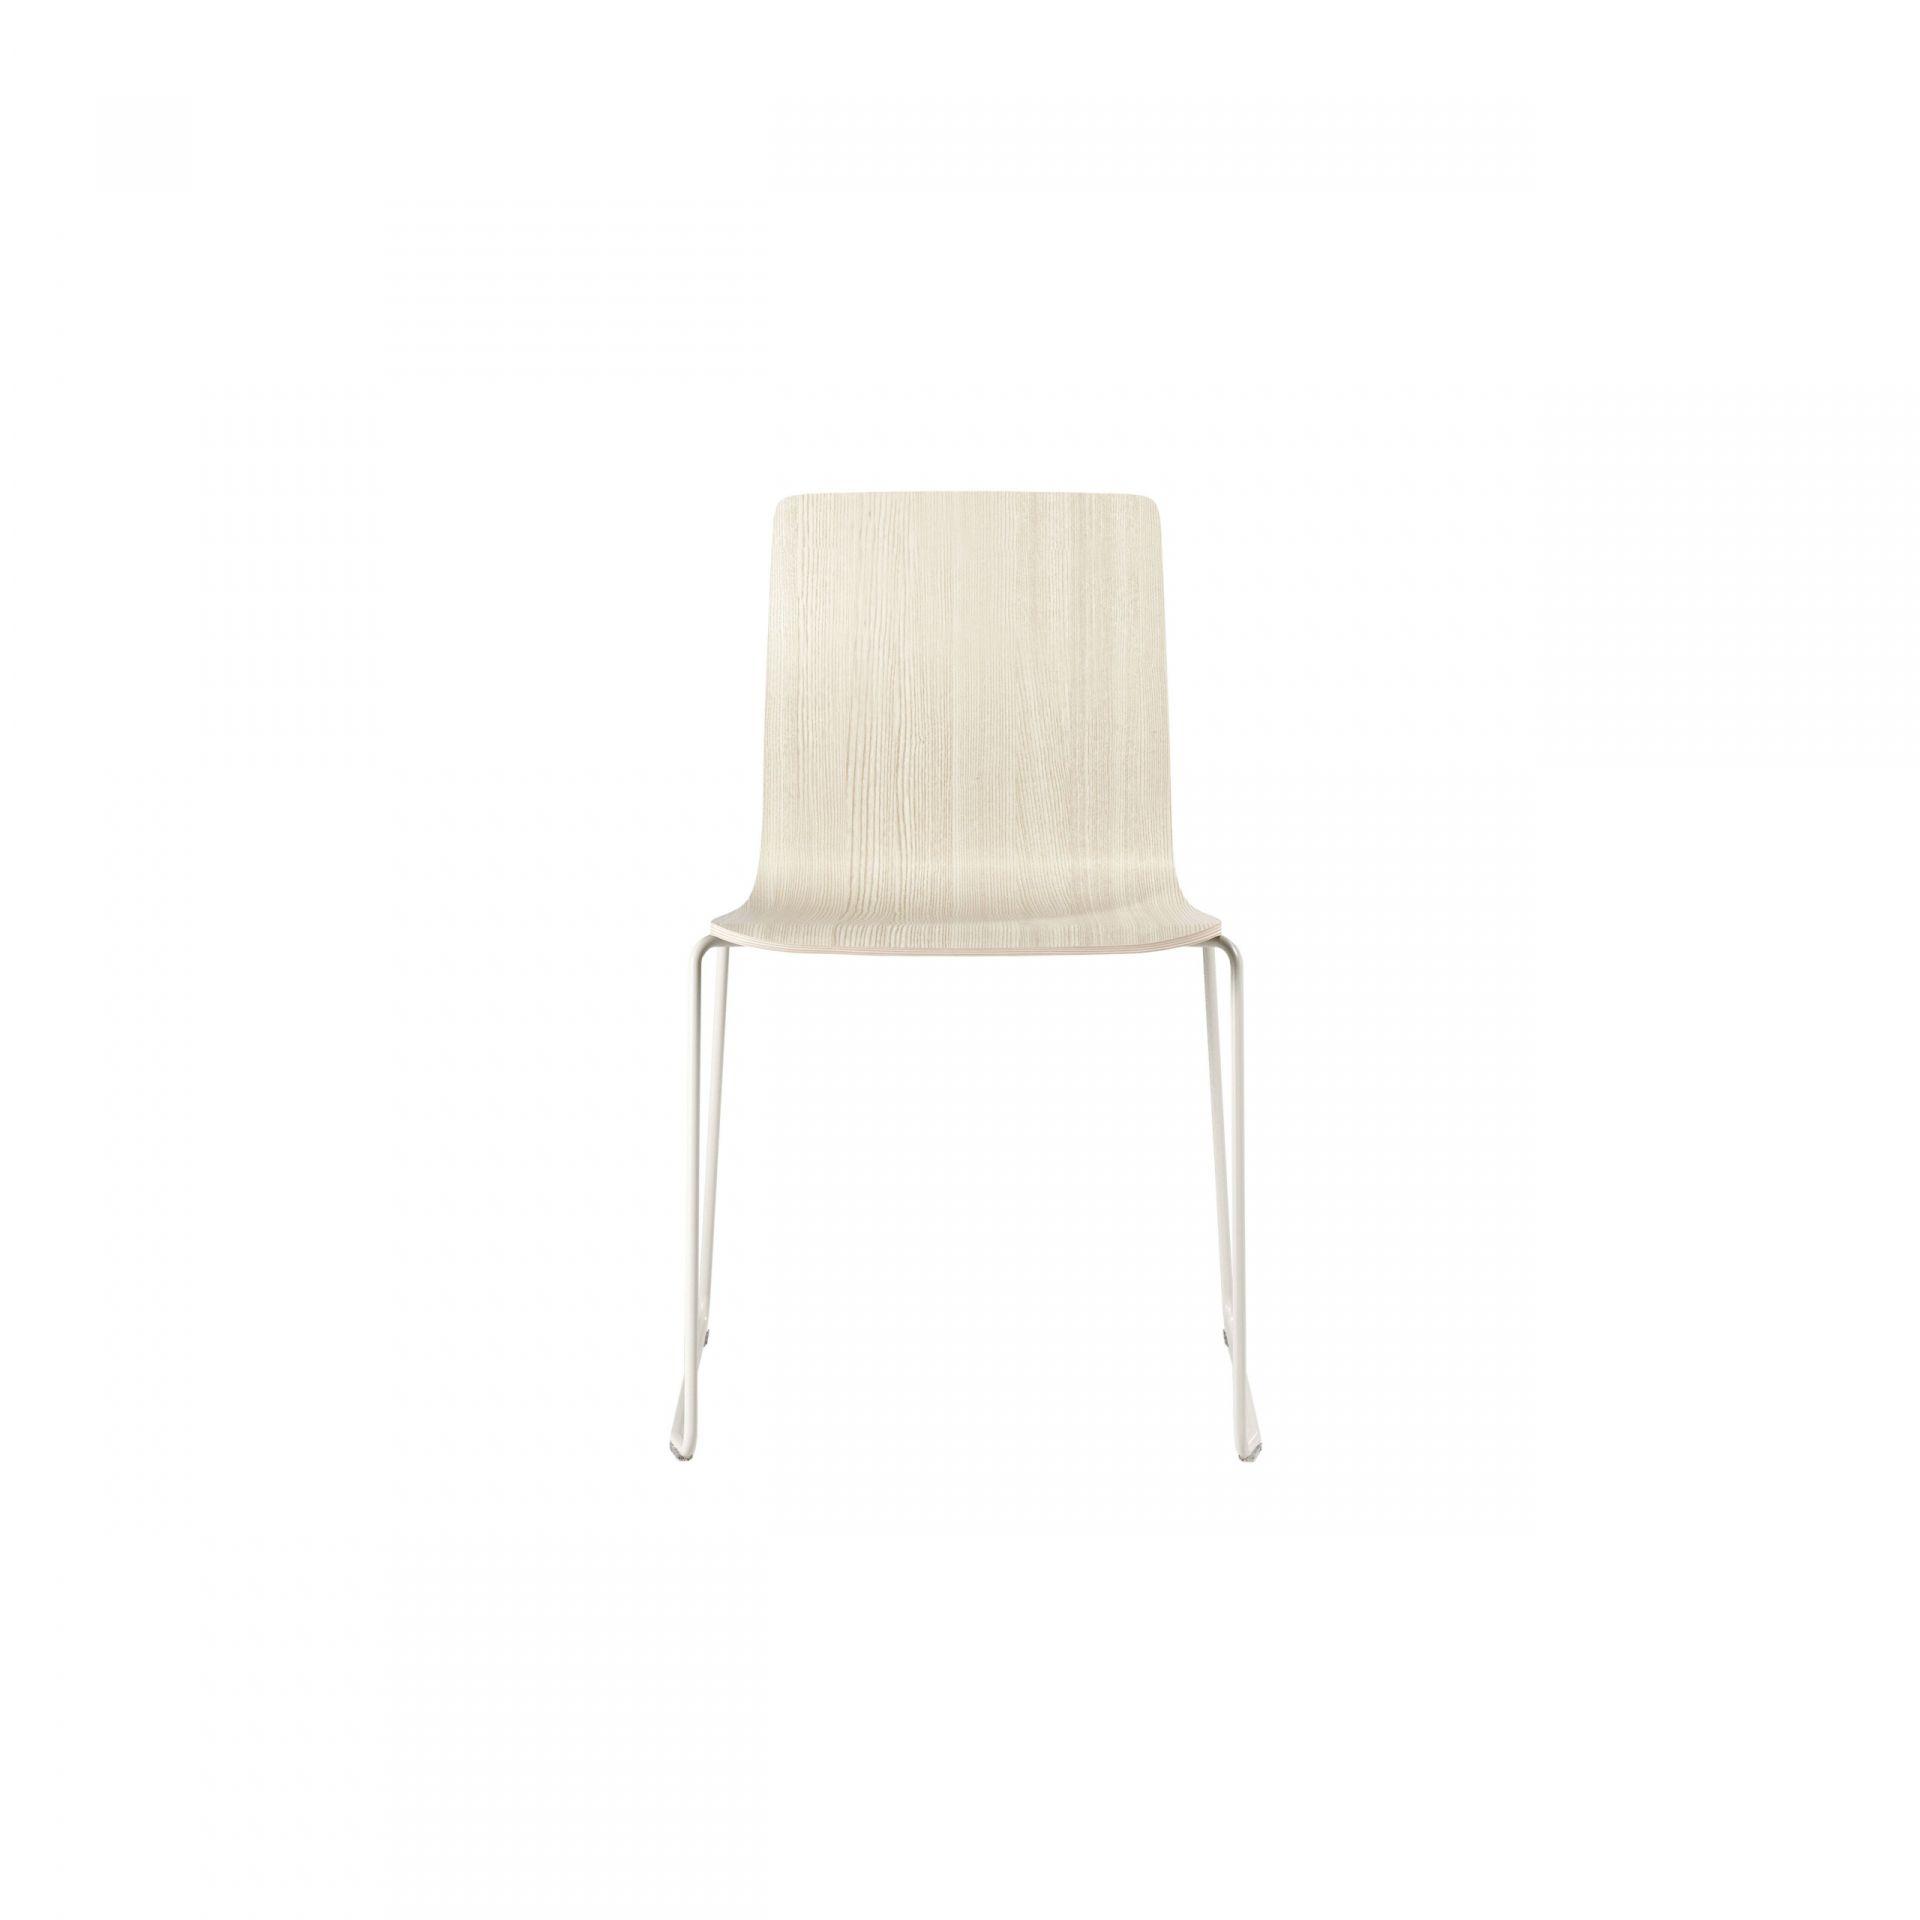 Nova Chair with sledge product image 2